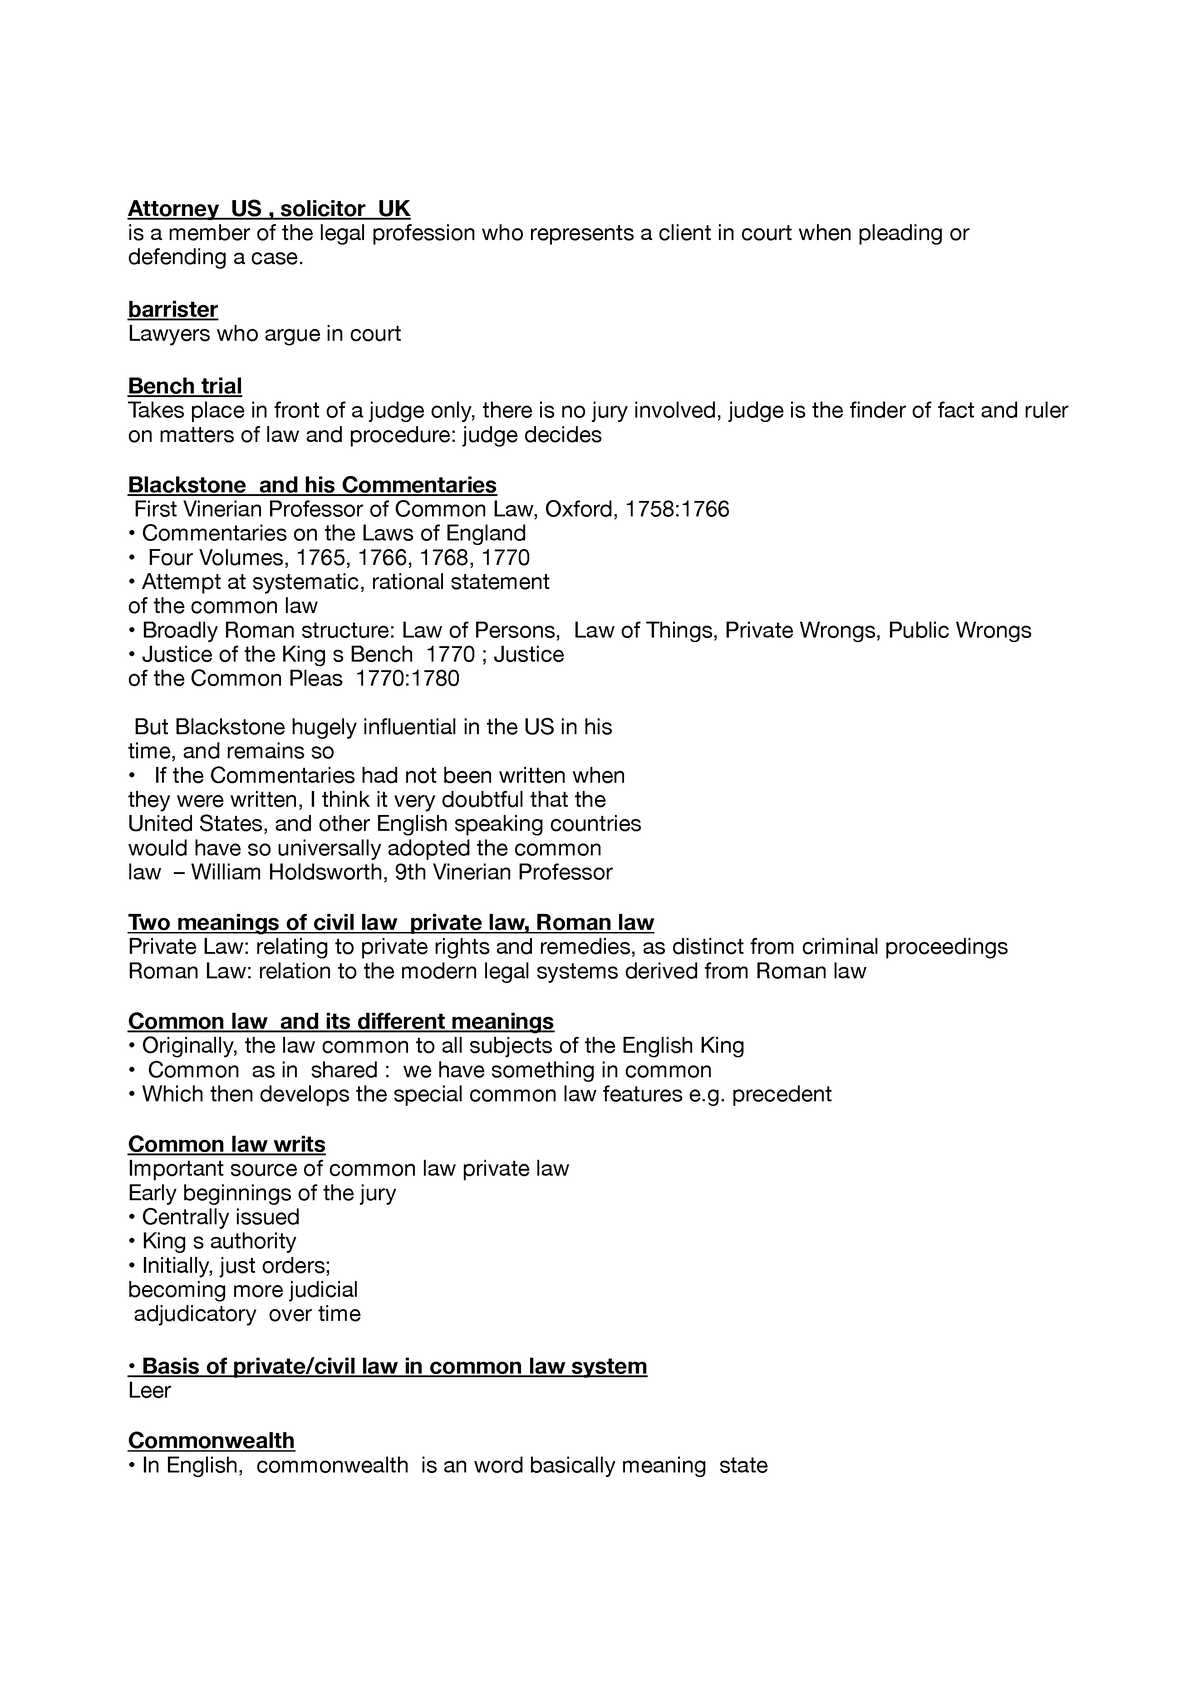 Common Law Legal System Exam List - 031690 - WWU - StuDocu